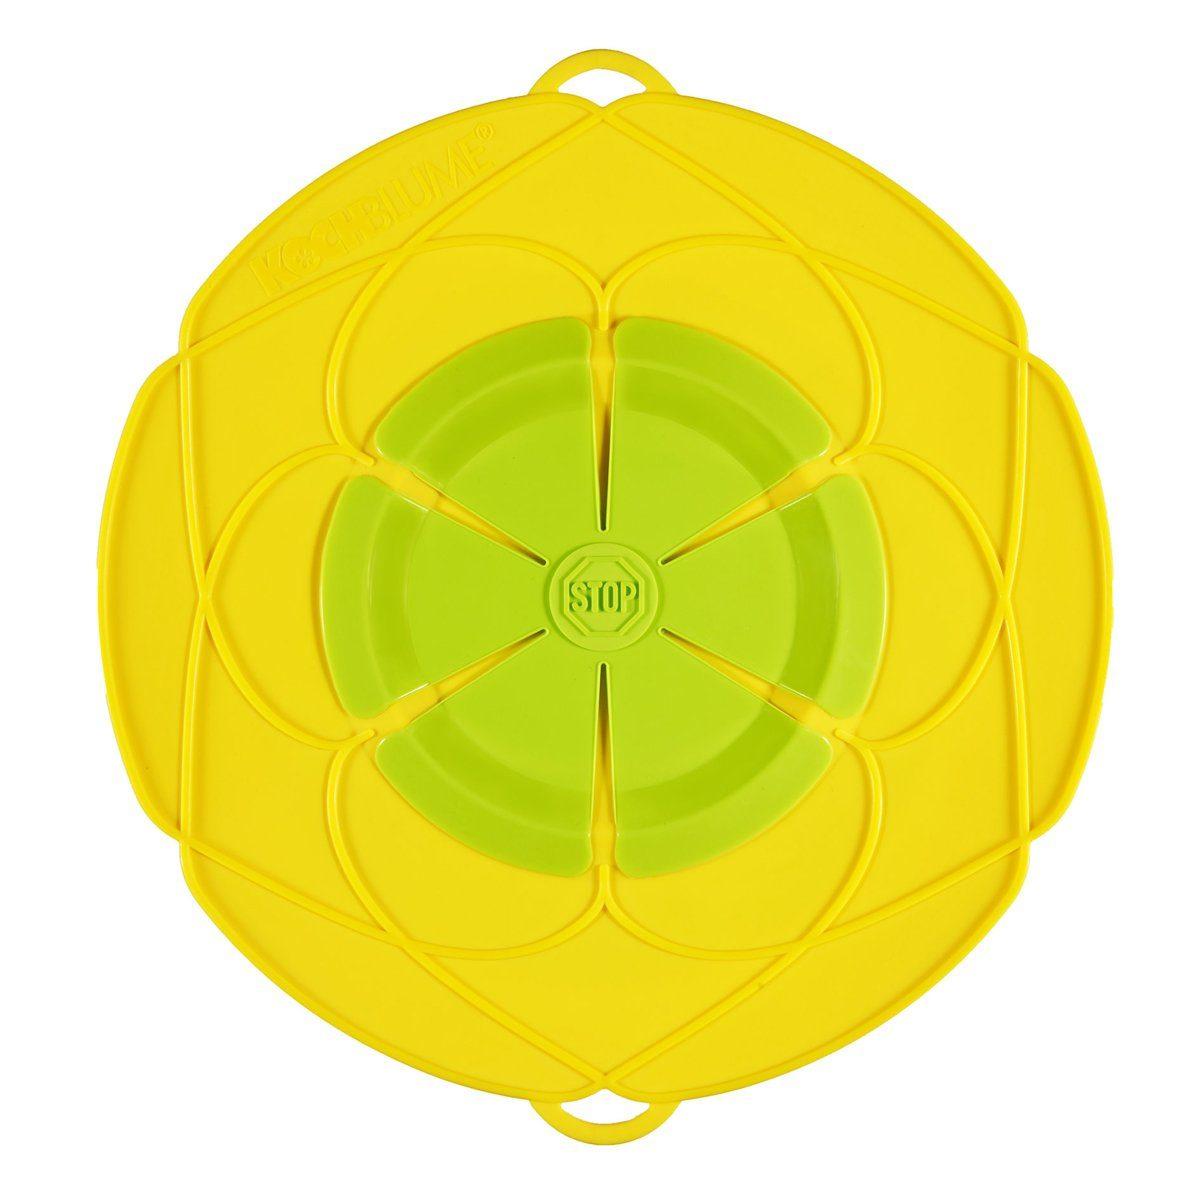 Kochblume Kochblume Überkochschutz gelb 29 cm